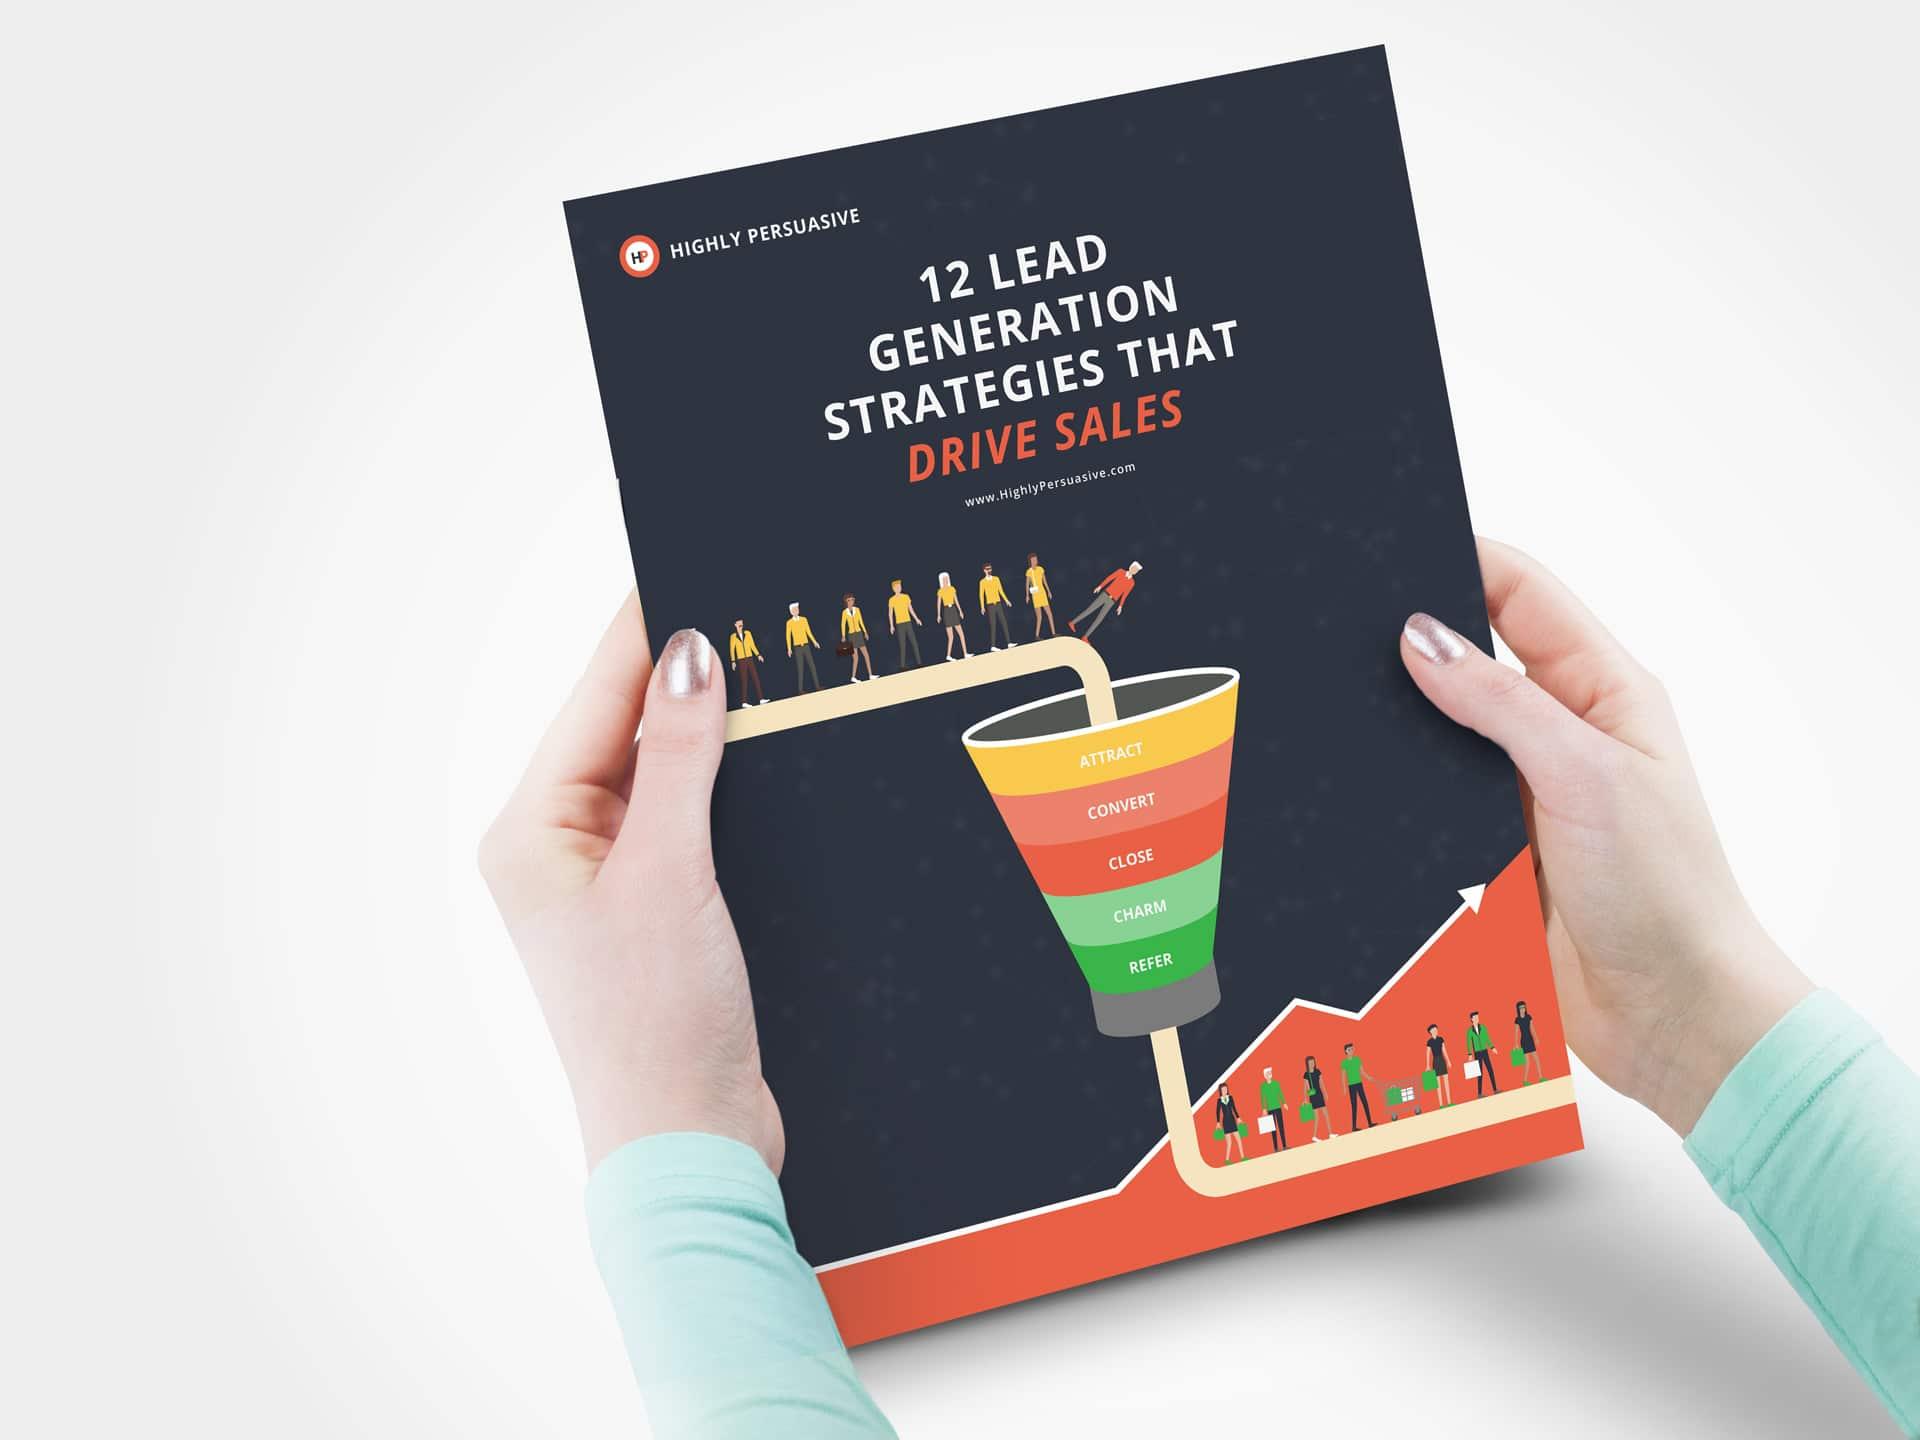 12 Lead Generation Strategies That Drive Sales for B2B